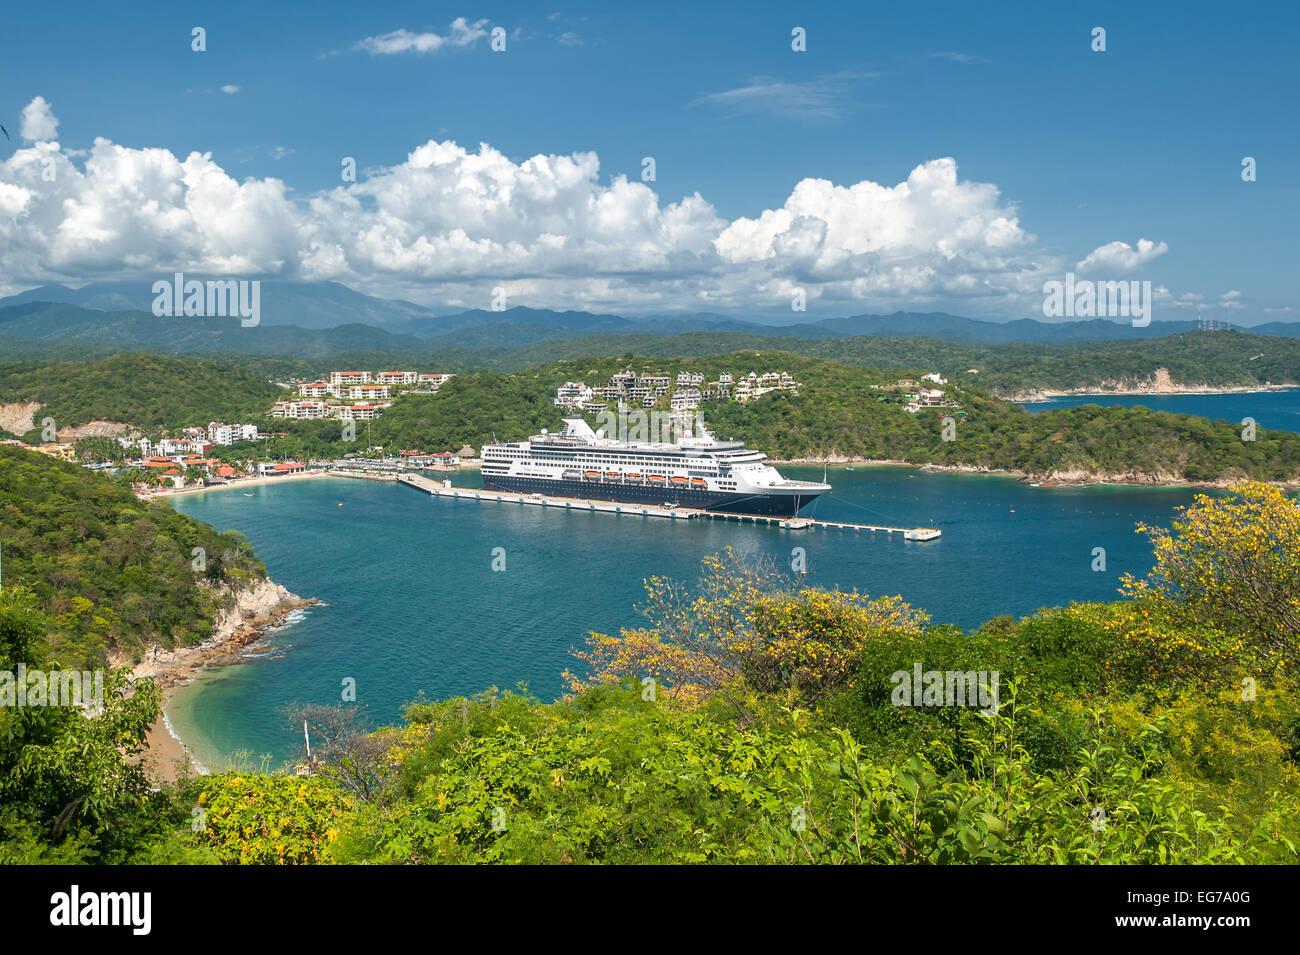 SANTA MARIA HUATULCO, OAXACA, MEXICO - November, 04, 2013: Cruise liner in Santa Maria Huatulko bay - Stock Image